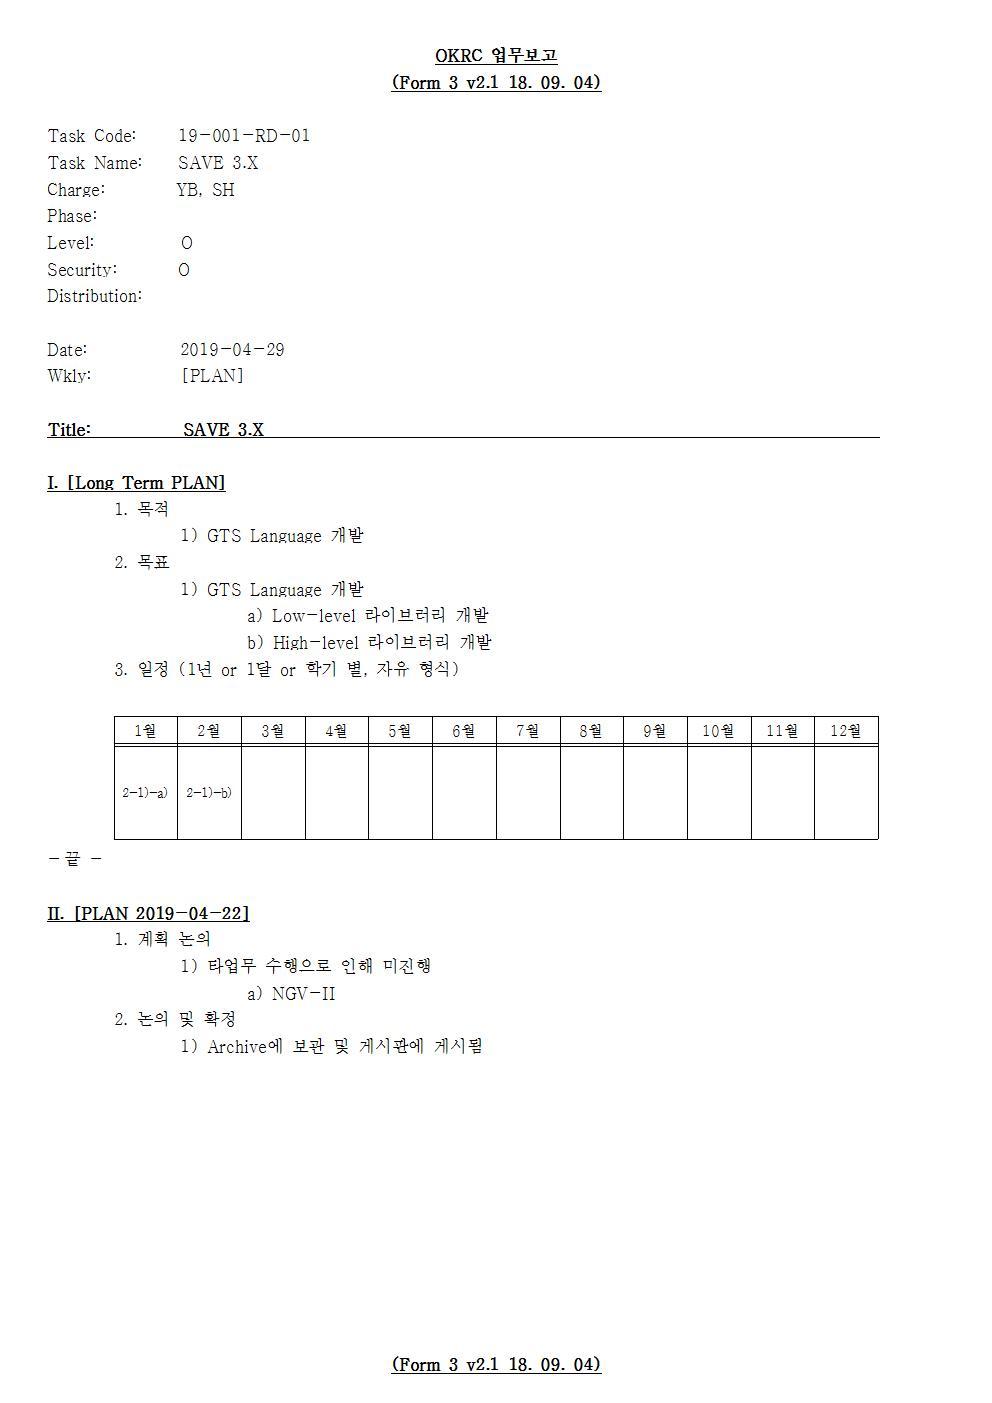 D-[19-001-RD-01]-[SAVE 3.X]-[2019-04-29][SH]001.jpg